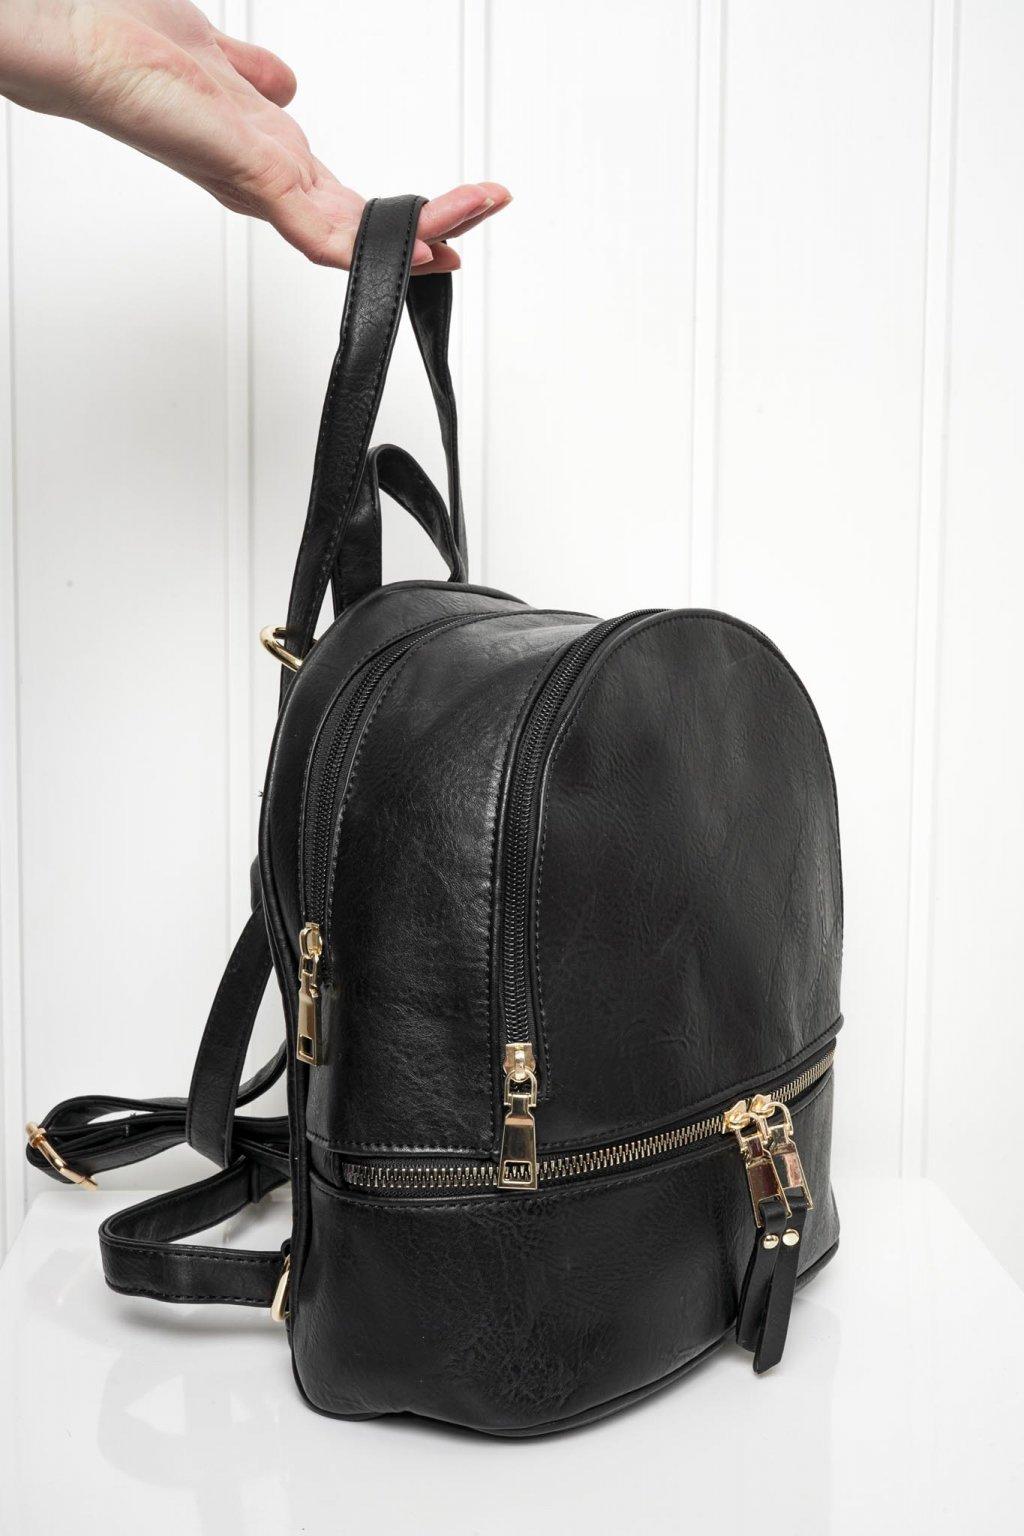 Kabelka, crossbody, ruksak, shopping bag, shopperka, 419